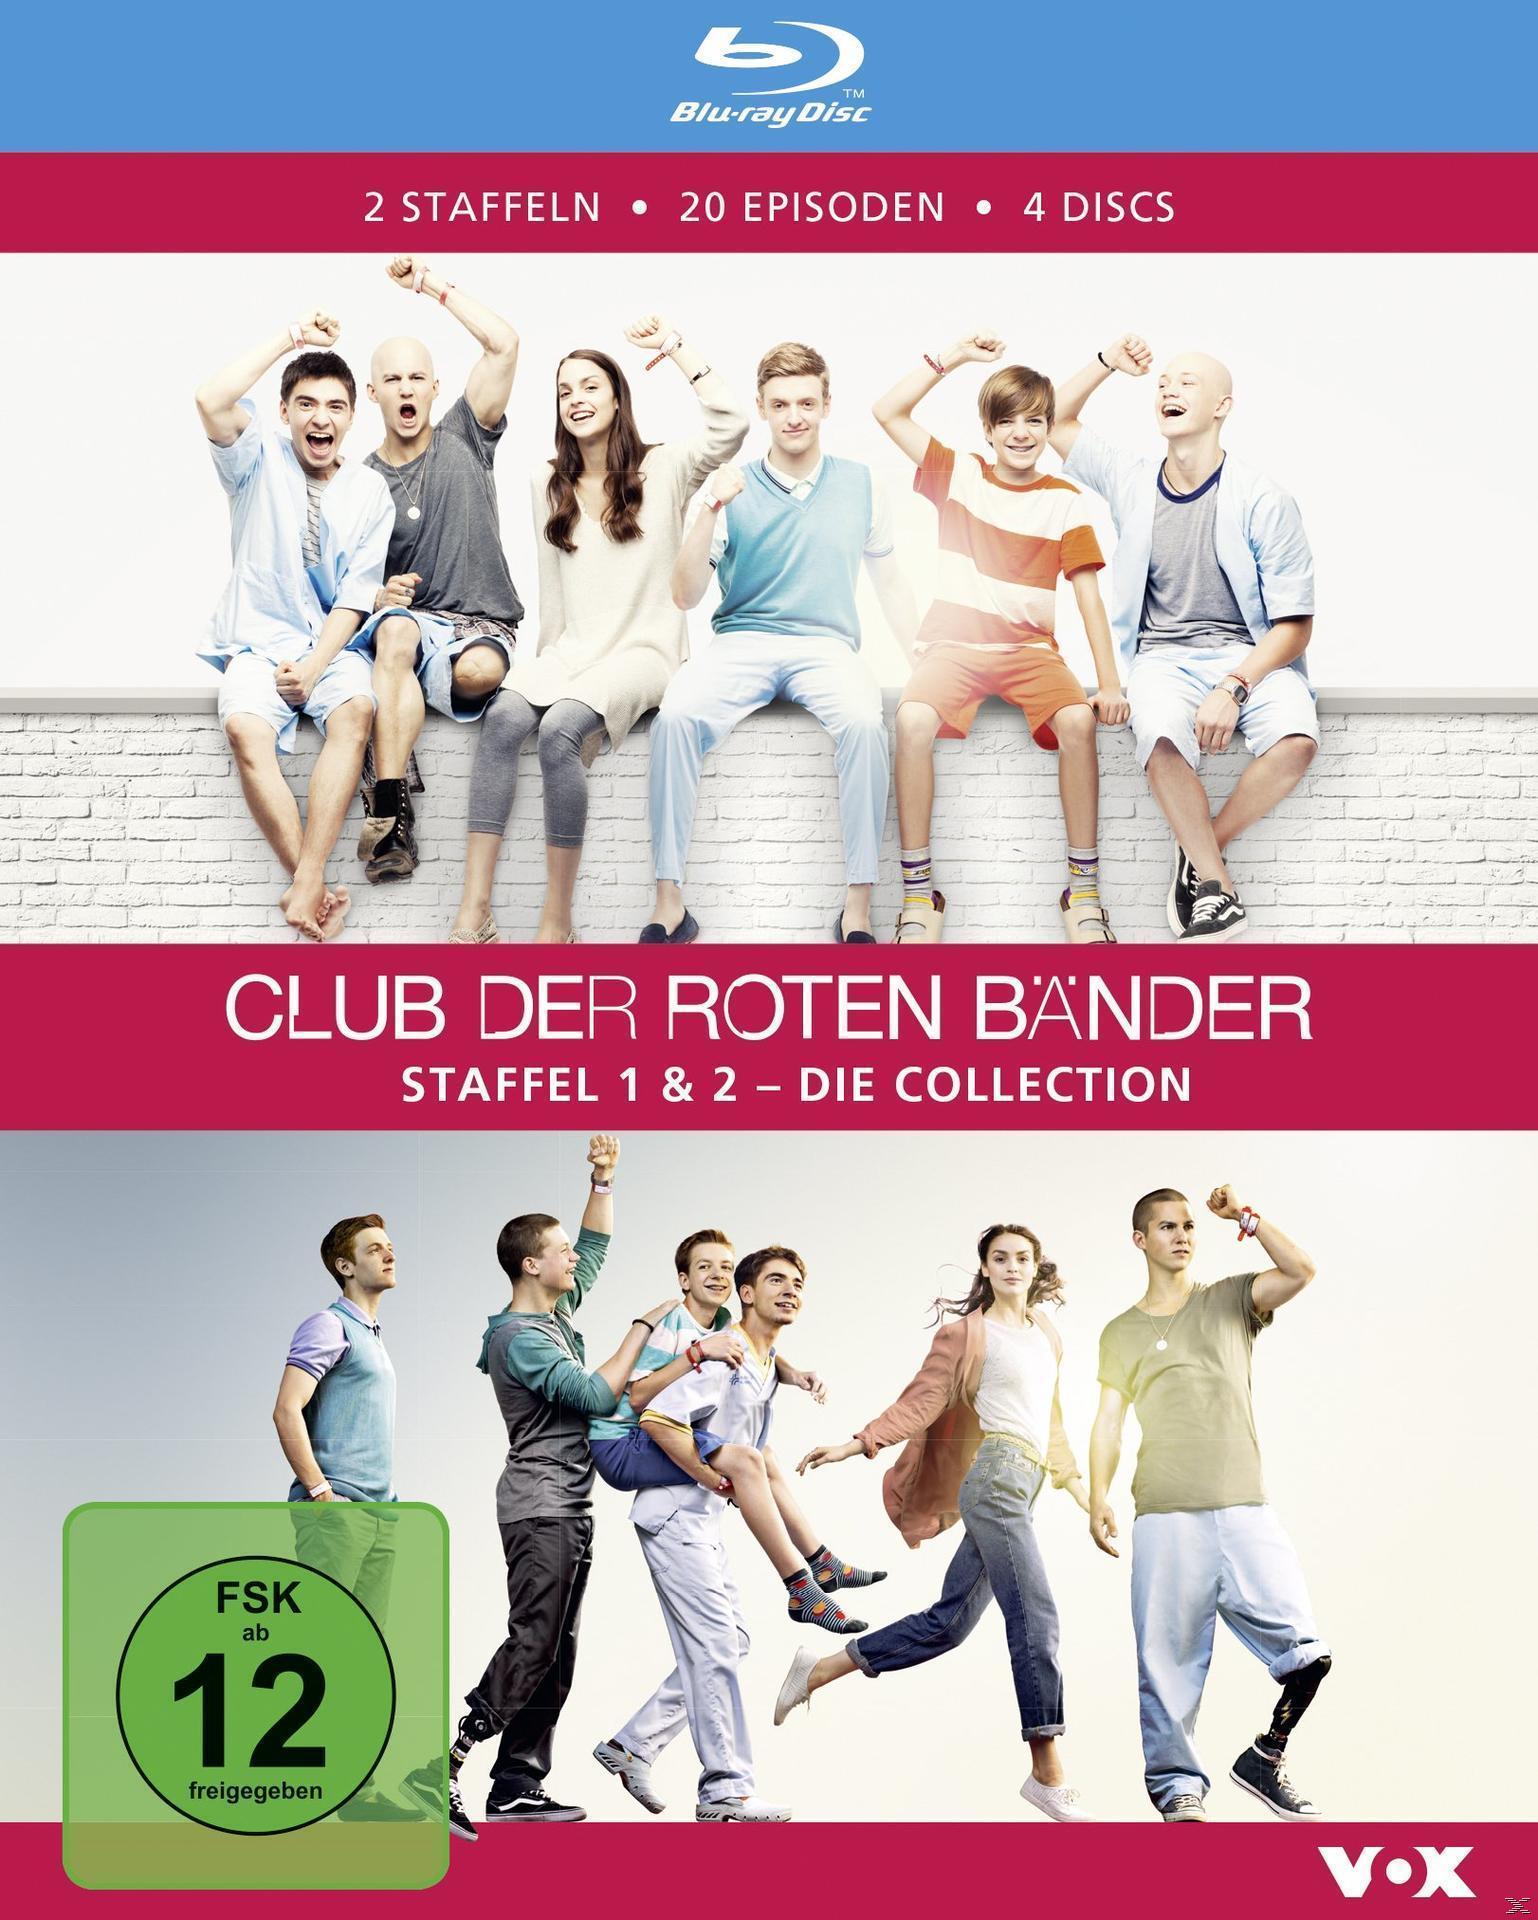 Club Raydi Film Ribbons Universe The Red Season 12blu zqSUMVpG